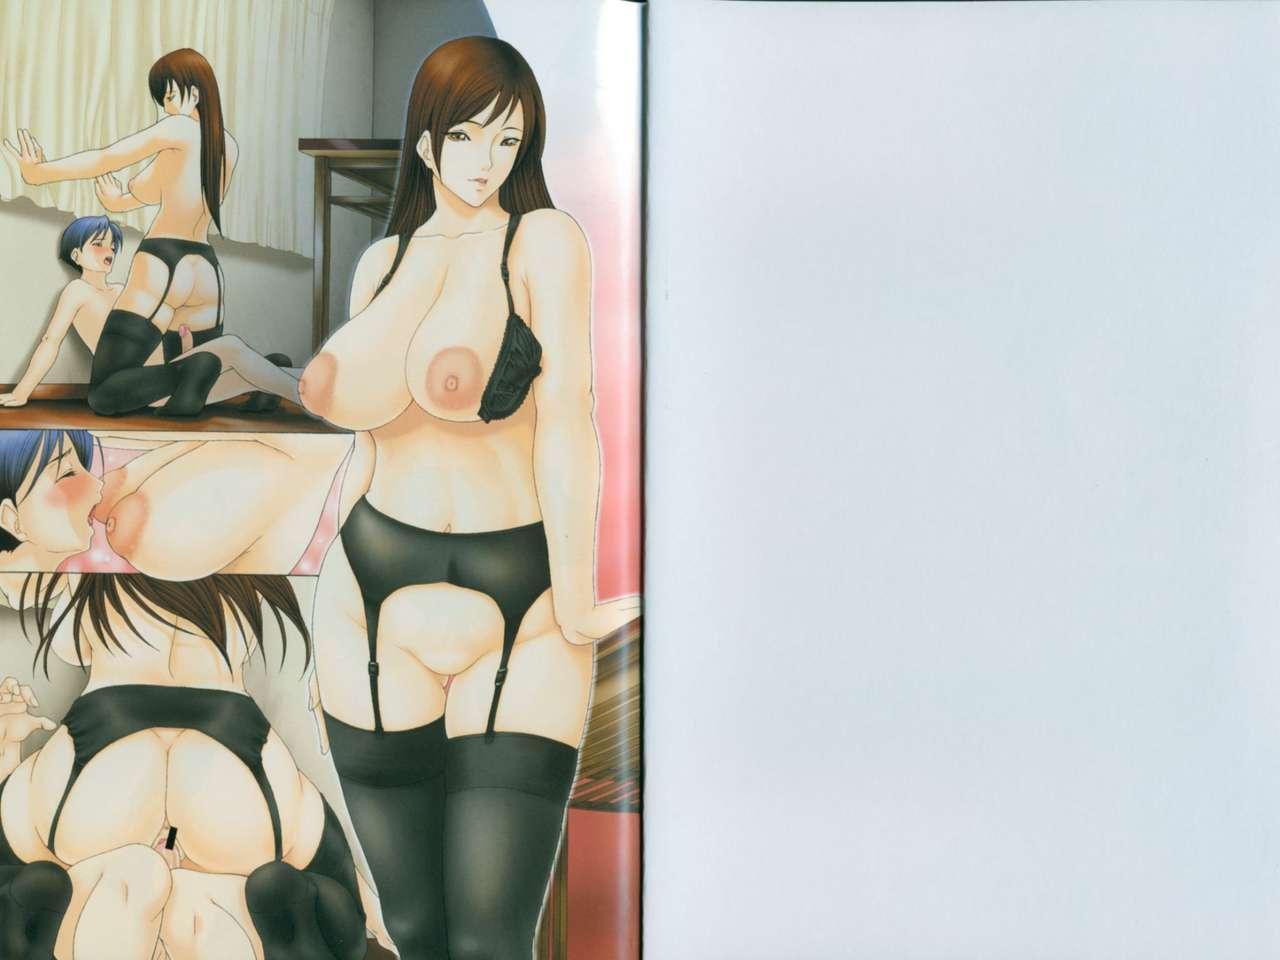 Senjou - A Desire is Instigated 2